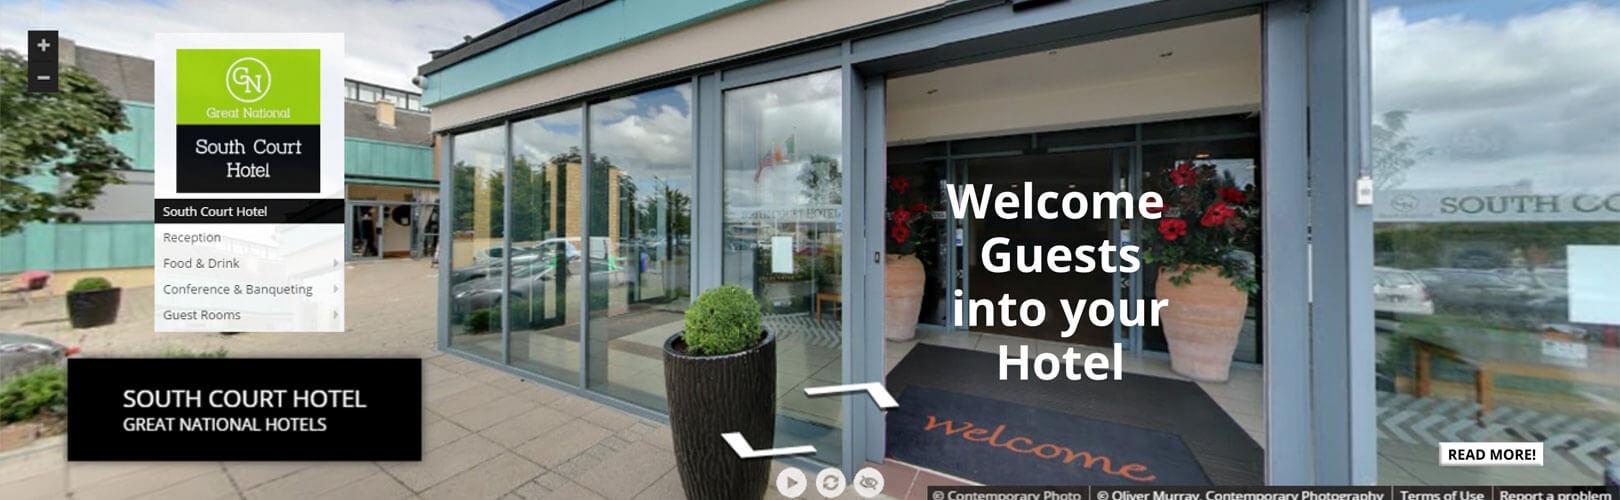 Hotel-Google-Street-View-Virtual-Tours-V1-2-1620x500-Slider